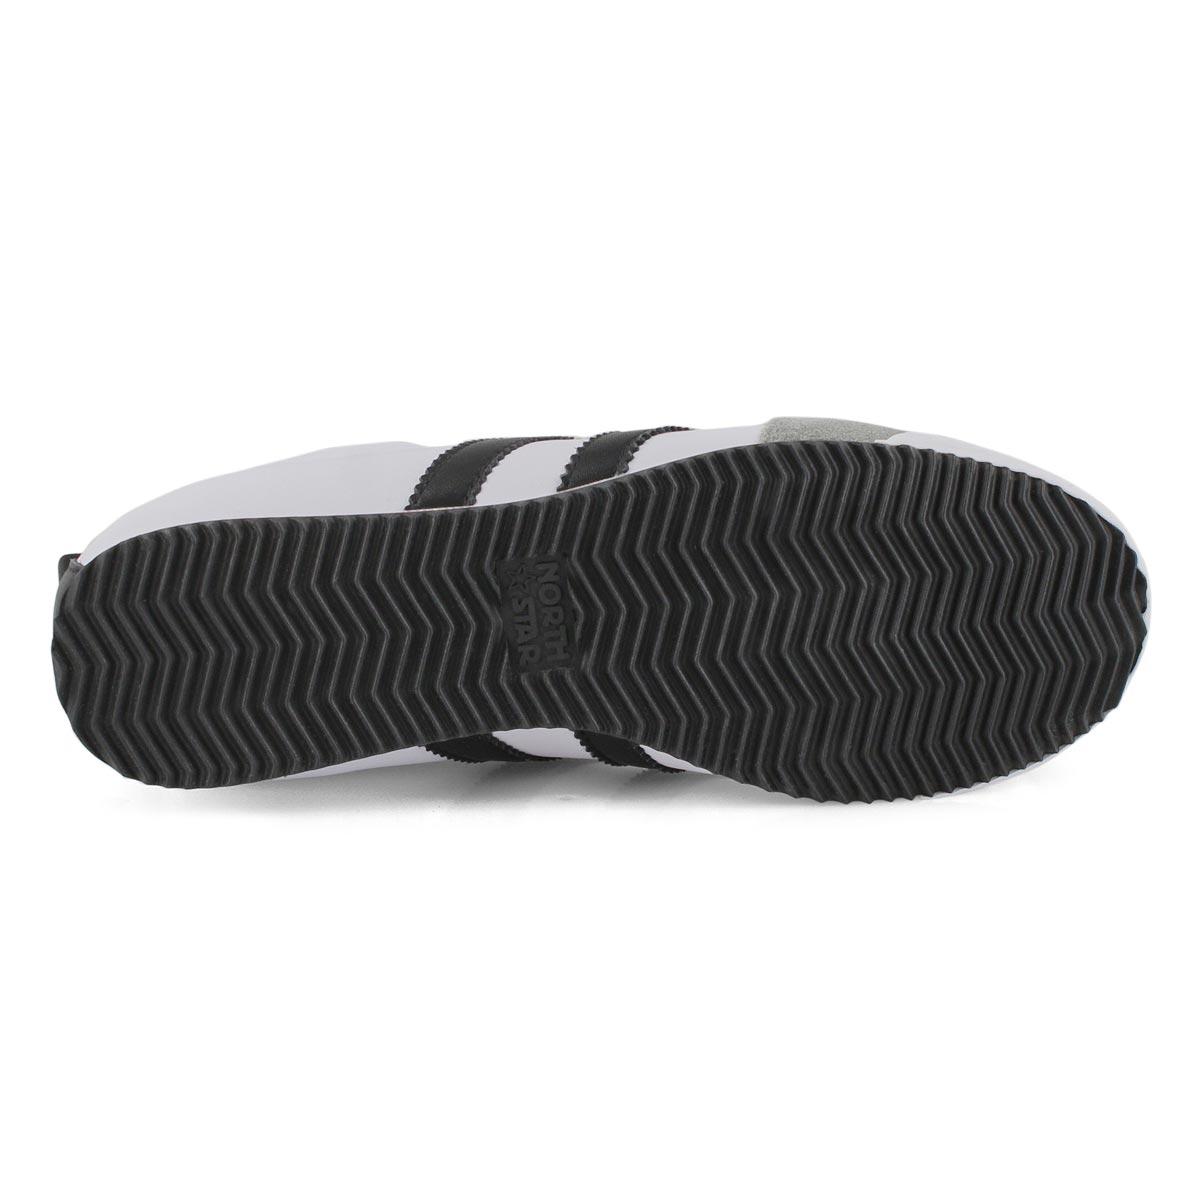 Mns North Star One white/black sneaker